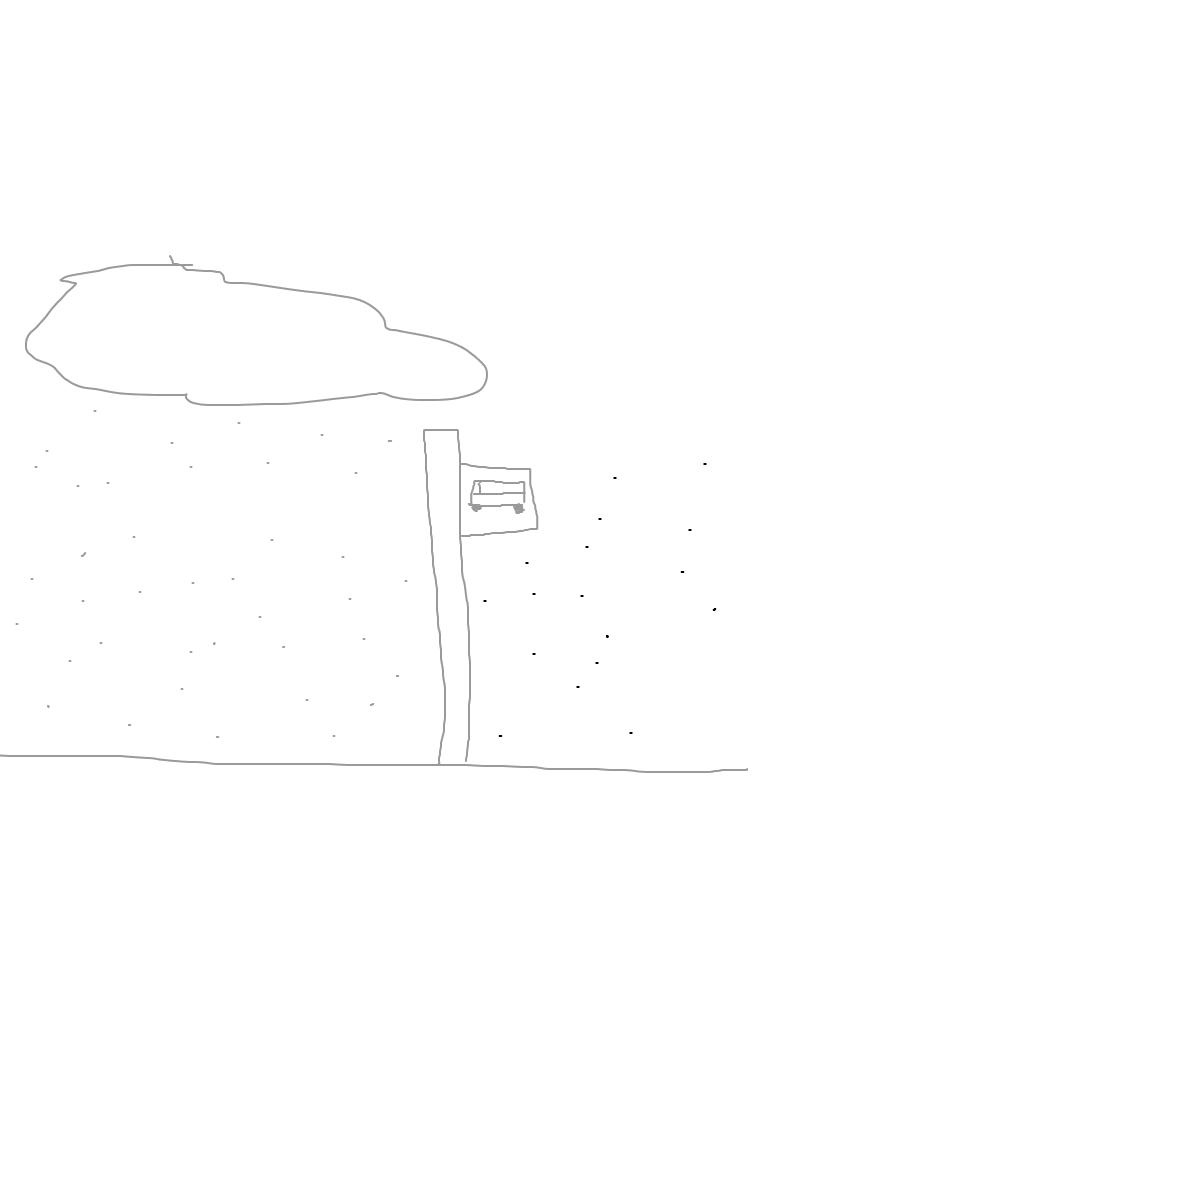 BAAAM drawing#1761 lat:46.3232574462890600lng: -79.4871978759765600